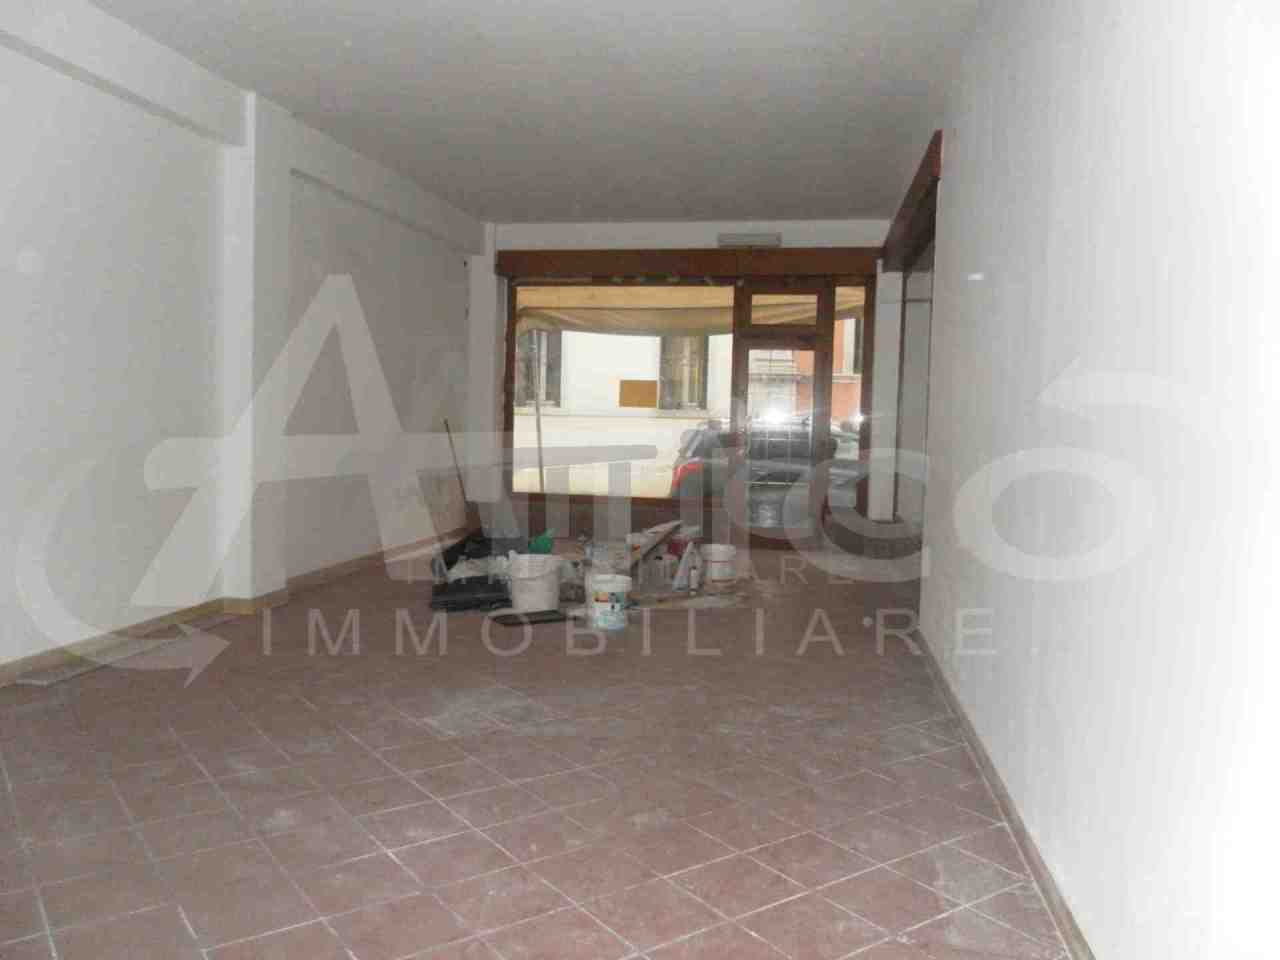 Locale commerciale - 2 Vetrine a Città, Rovigo Rif. 10085286